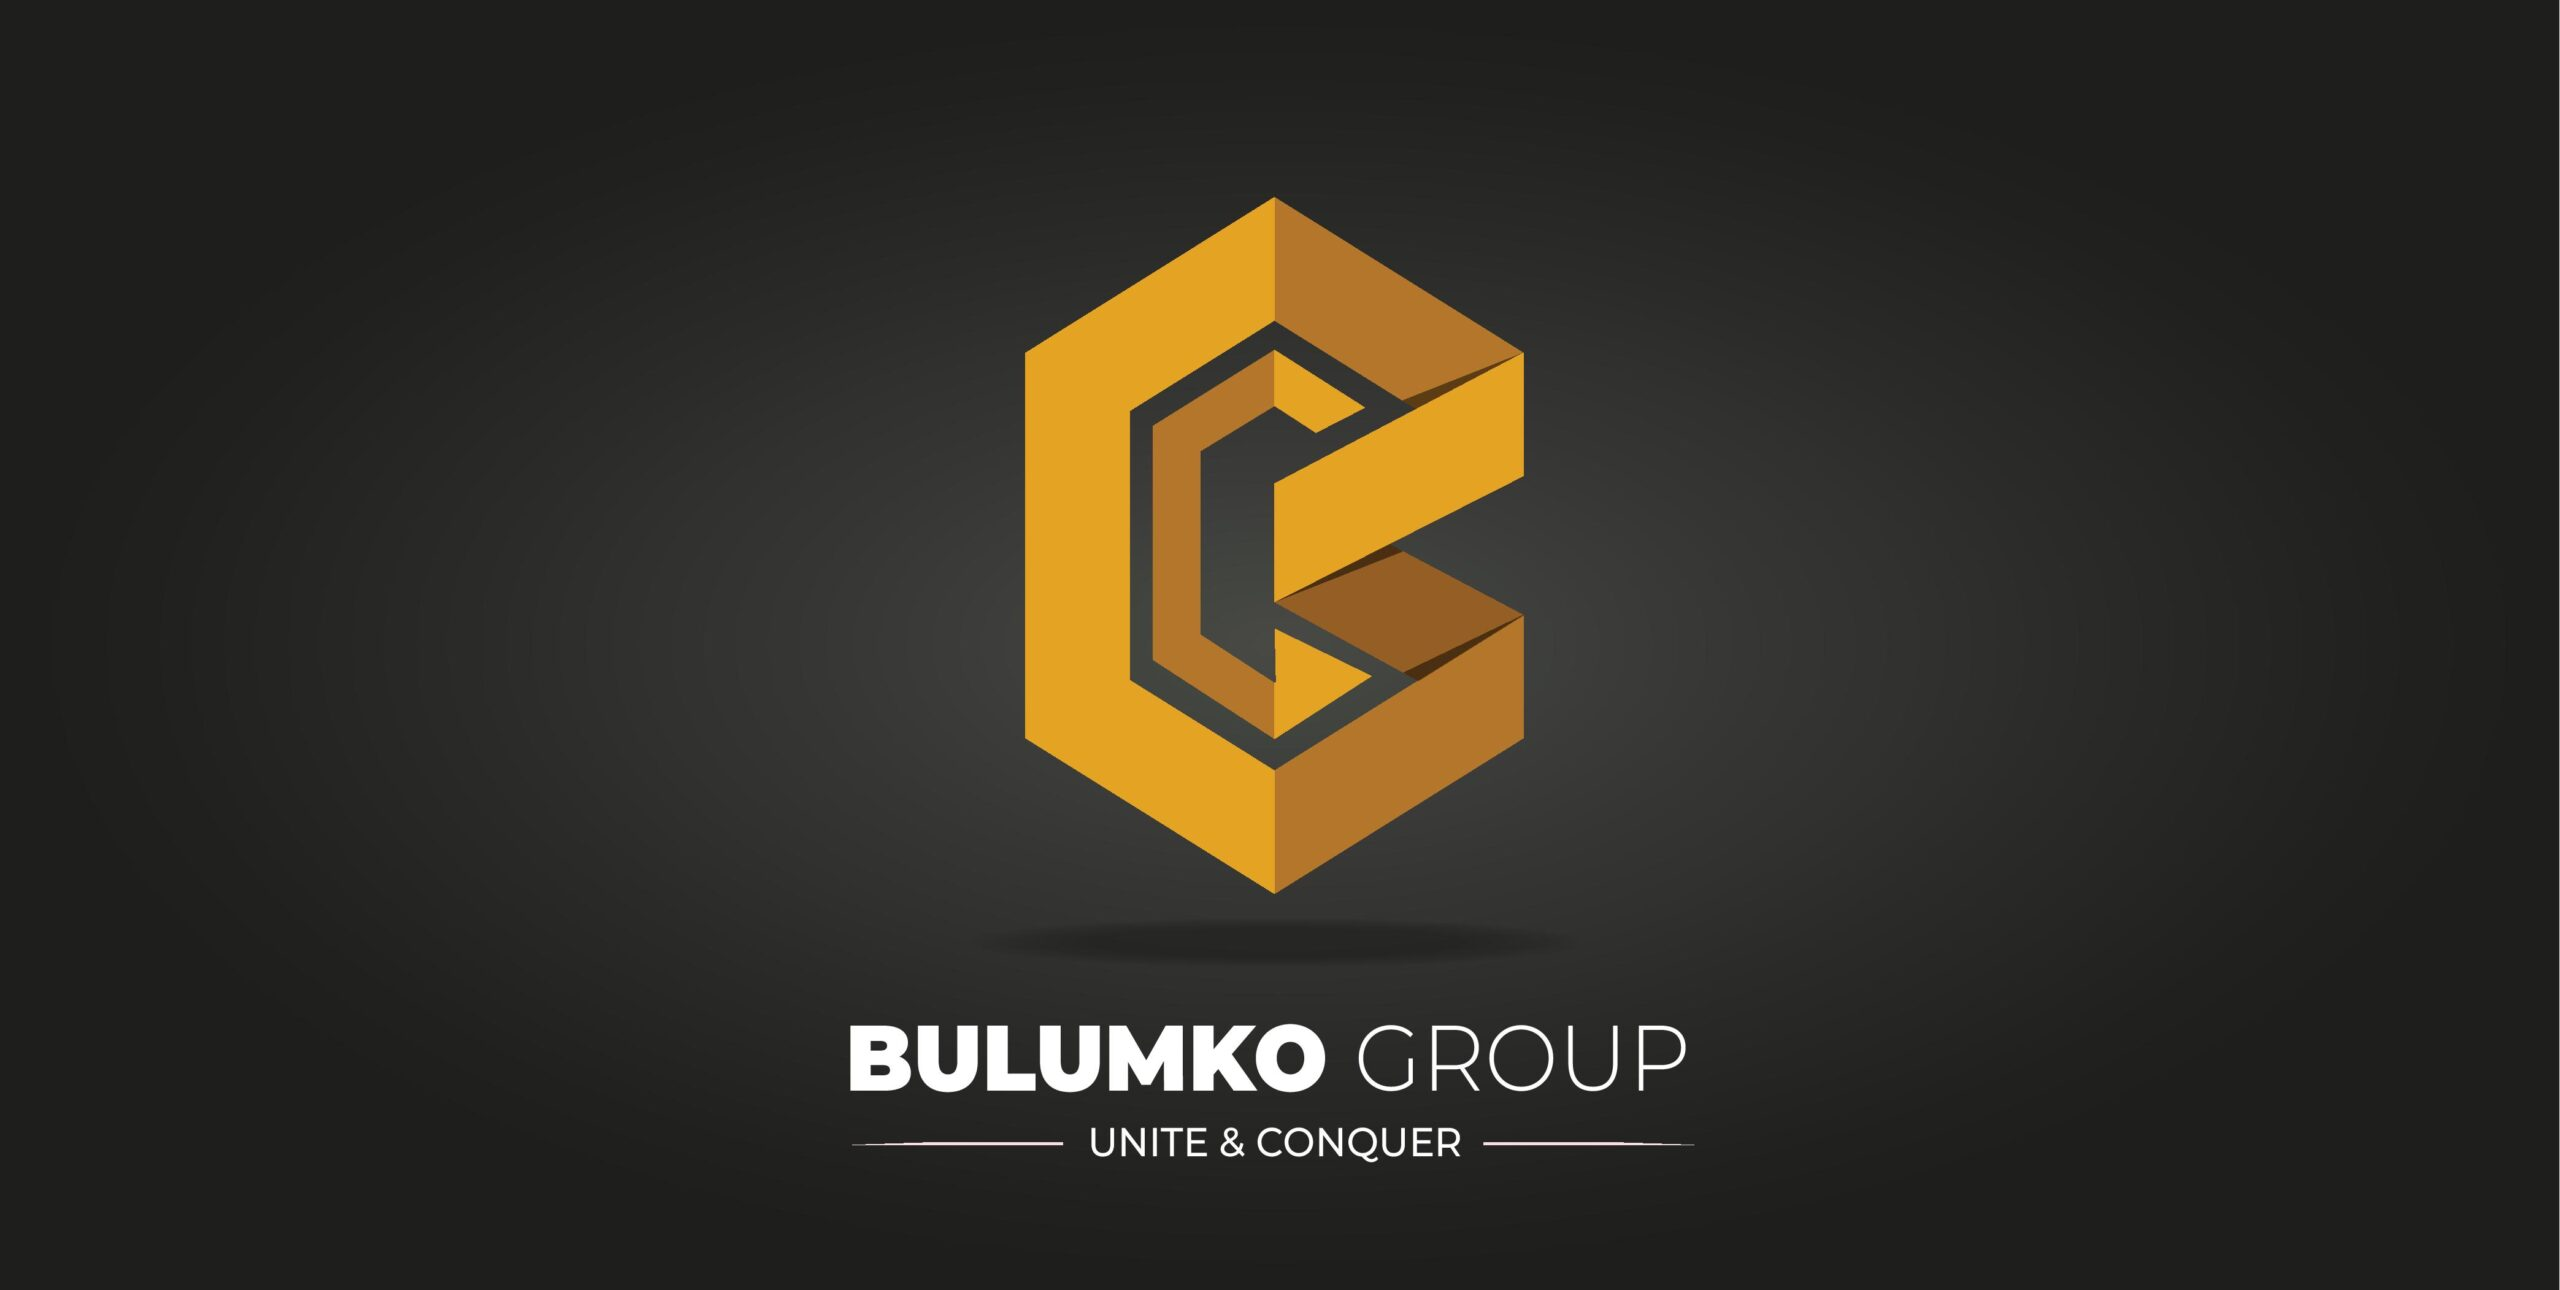 Bulunko Group Website